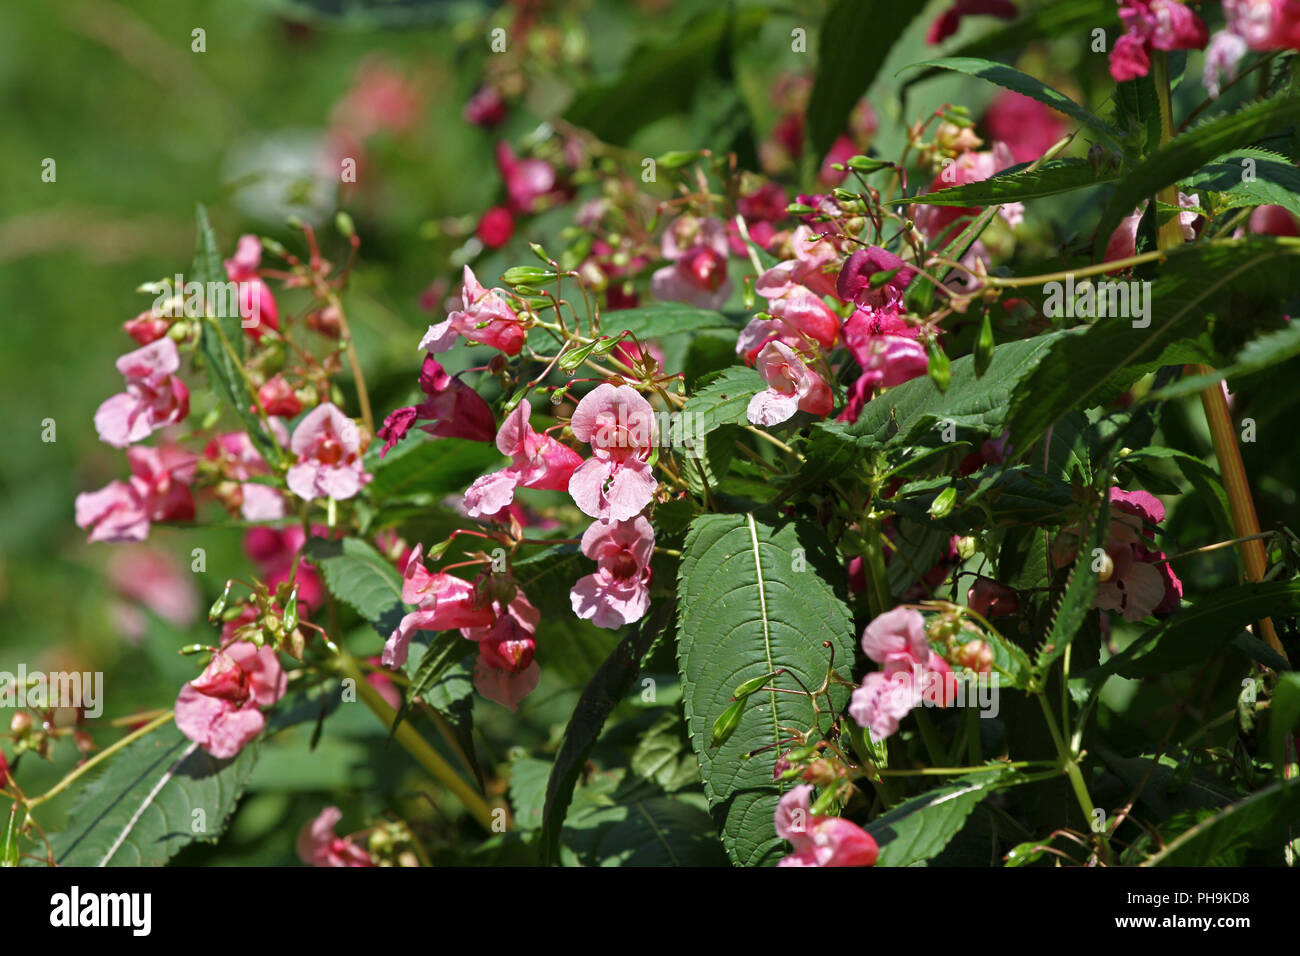 Impatiens glandulifera, Jewelweed, Balsamine de l'Himalaya dans le jardin. Impatiens glandulifera bush fleurs piscine dans la nature. Motif floral. Fleurs backg Banque D'Images